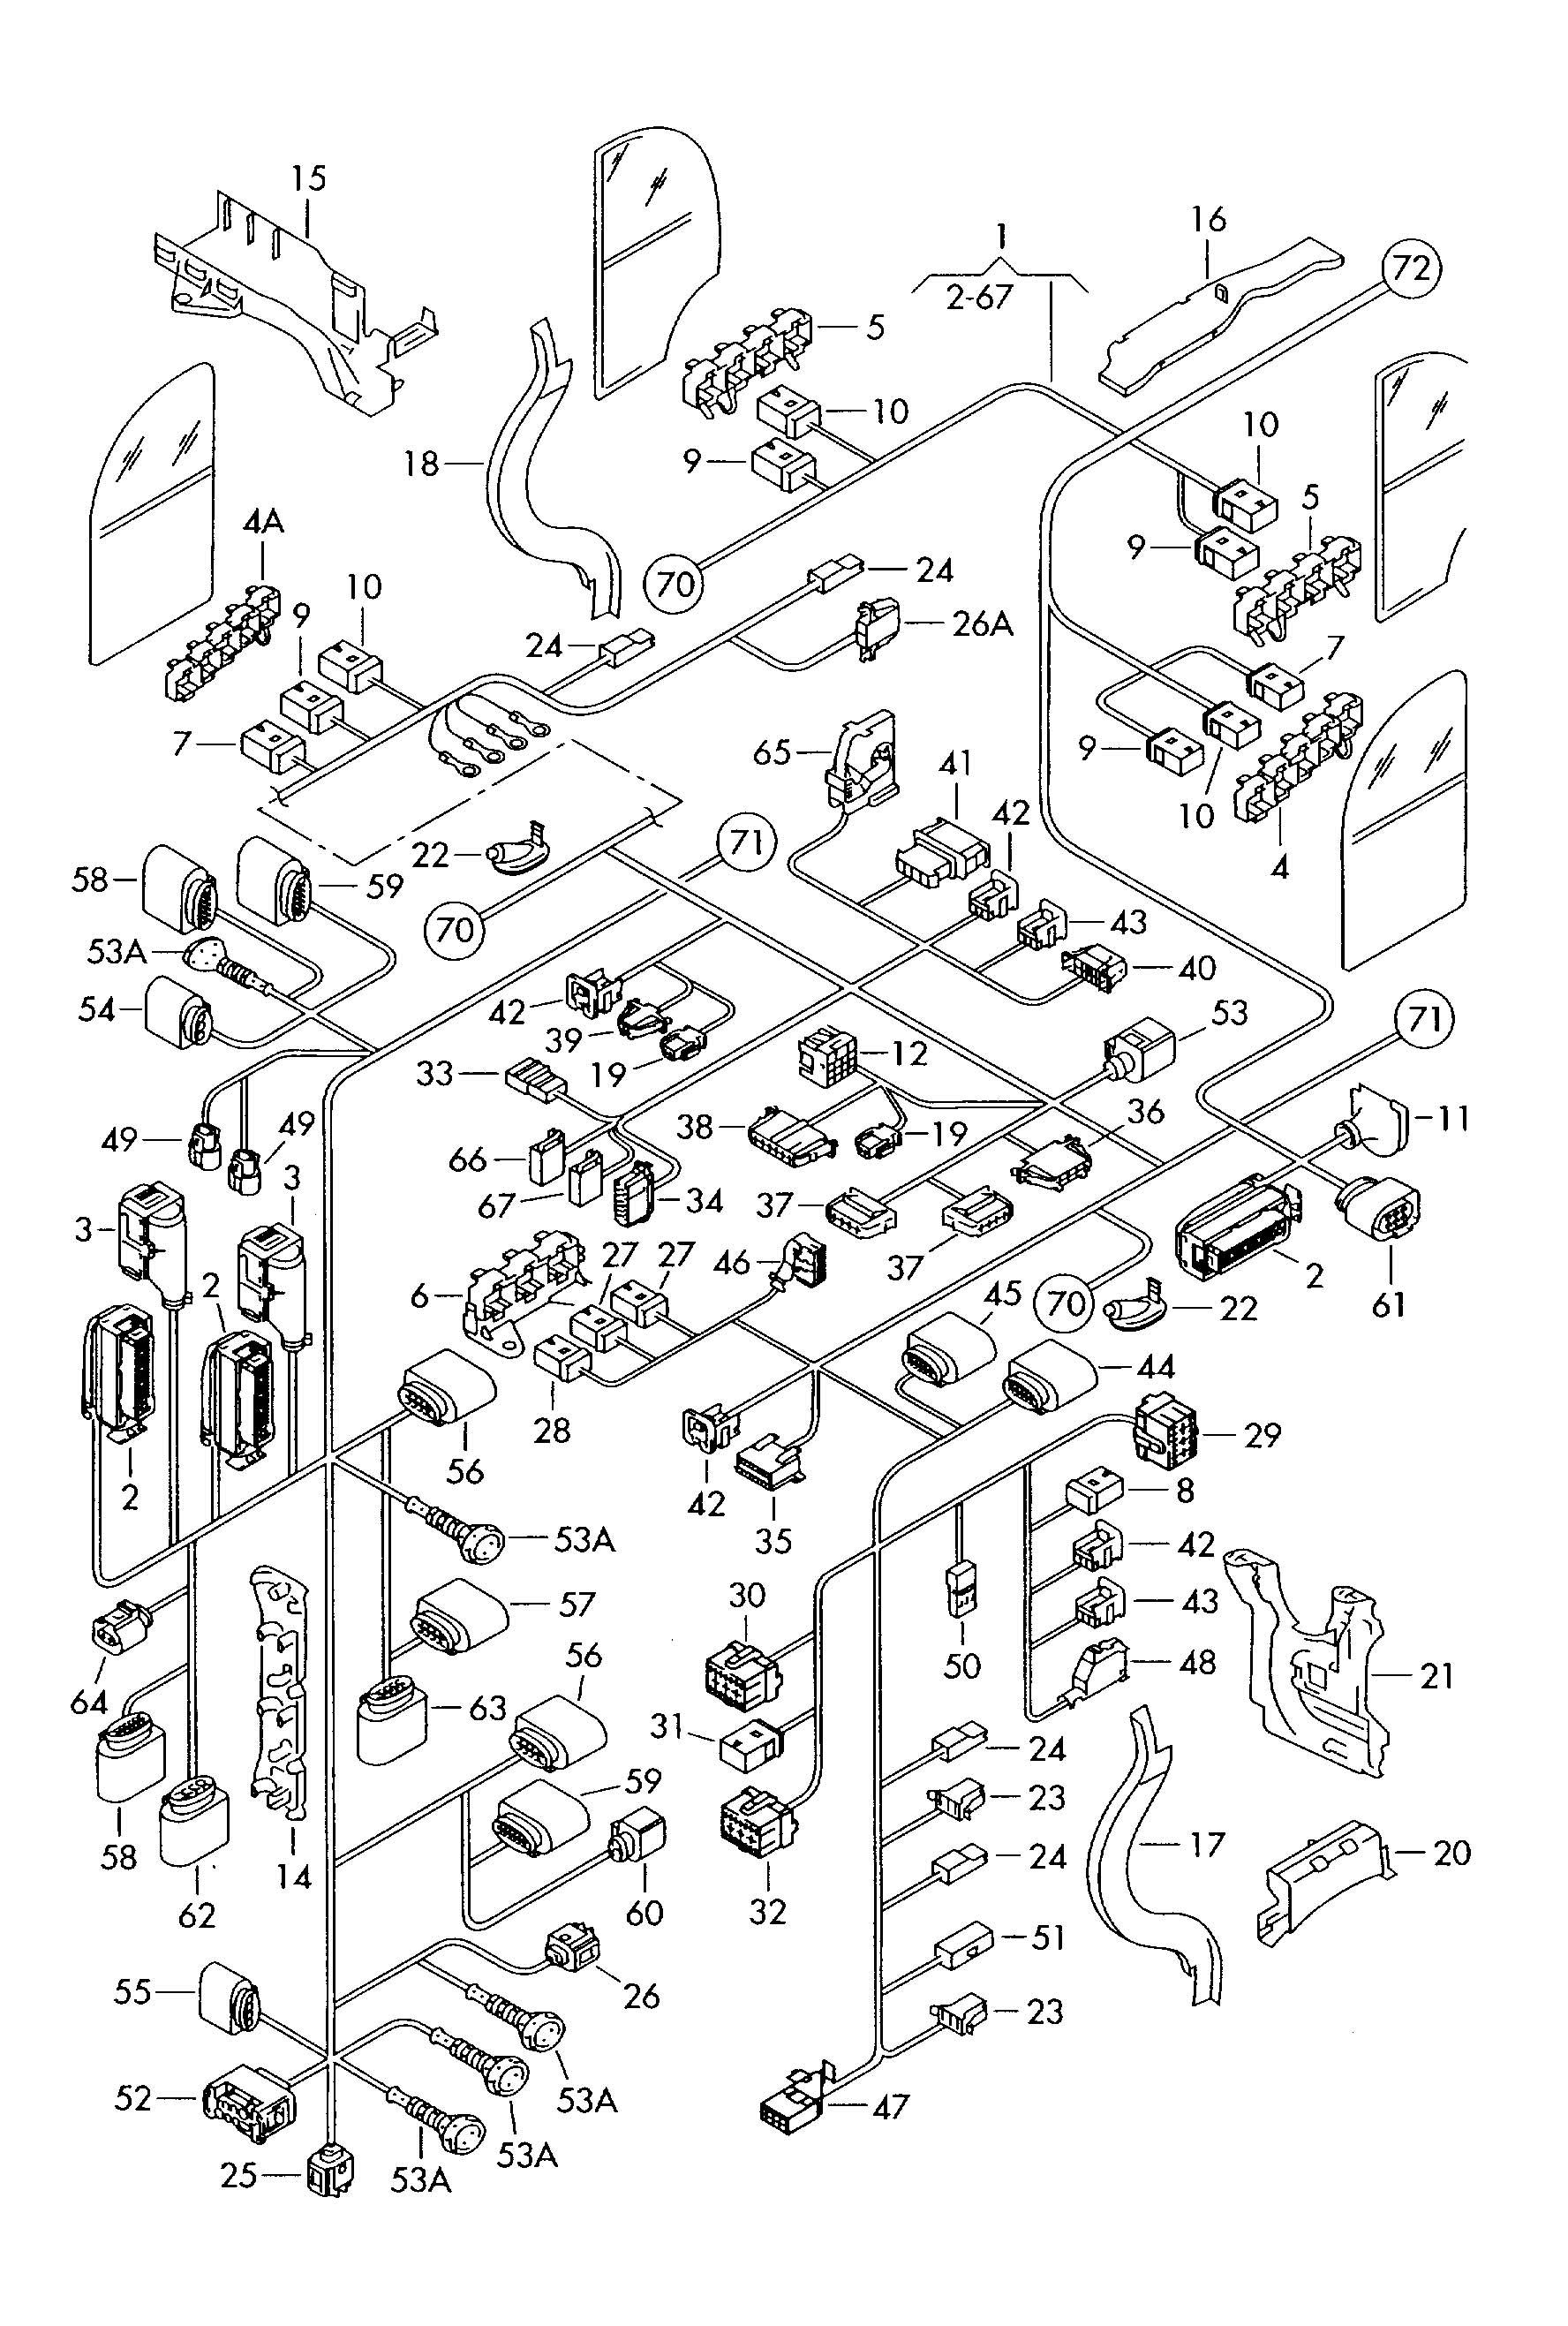 volkswagen phaeton central wiring harness single parts